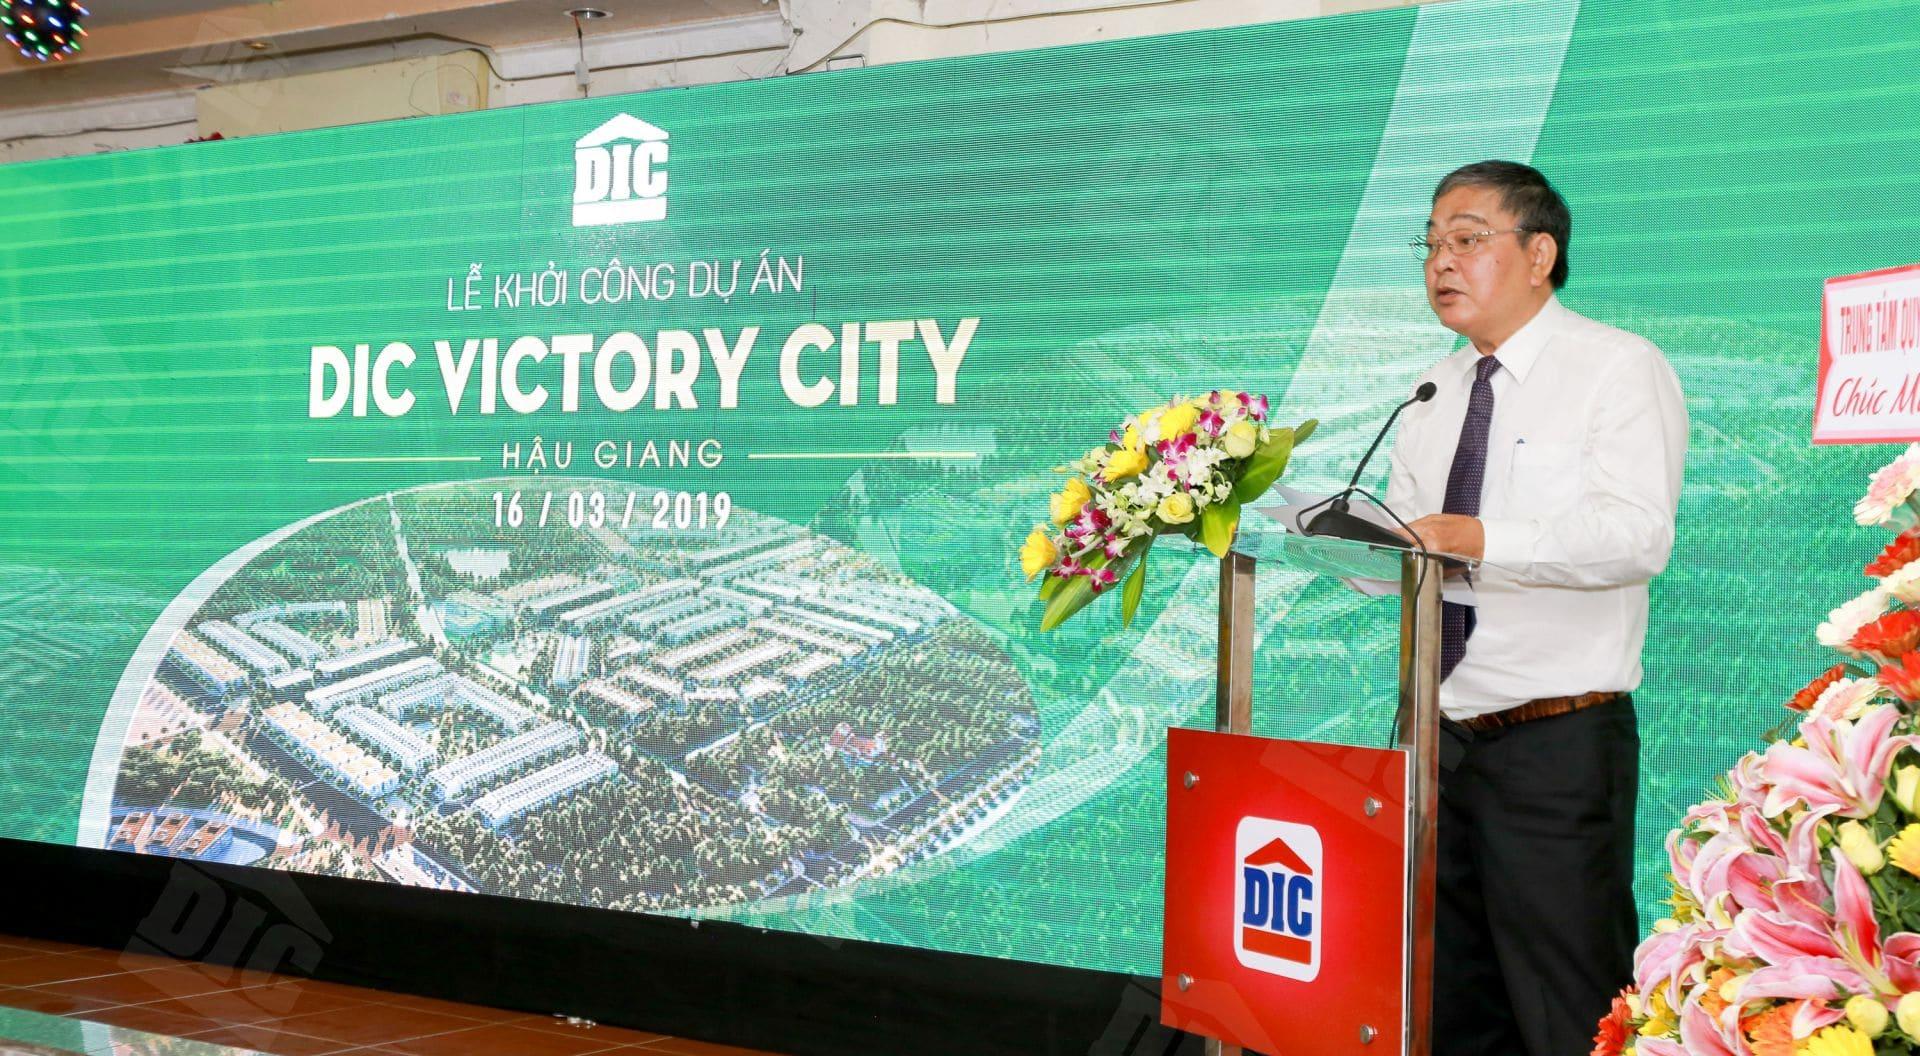 Le dong tho DIC Victory City Hau Giang - DIC VICTORY CITY